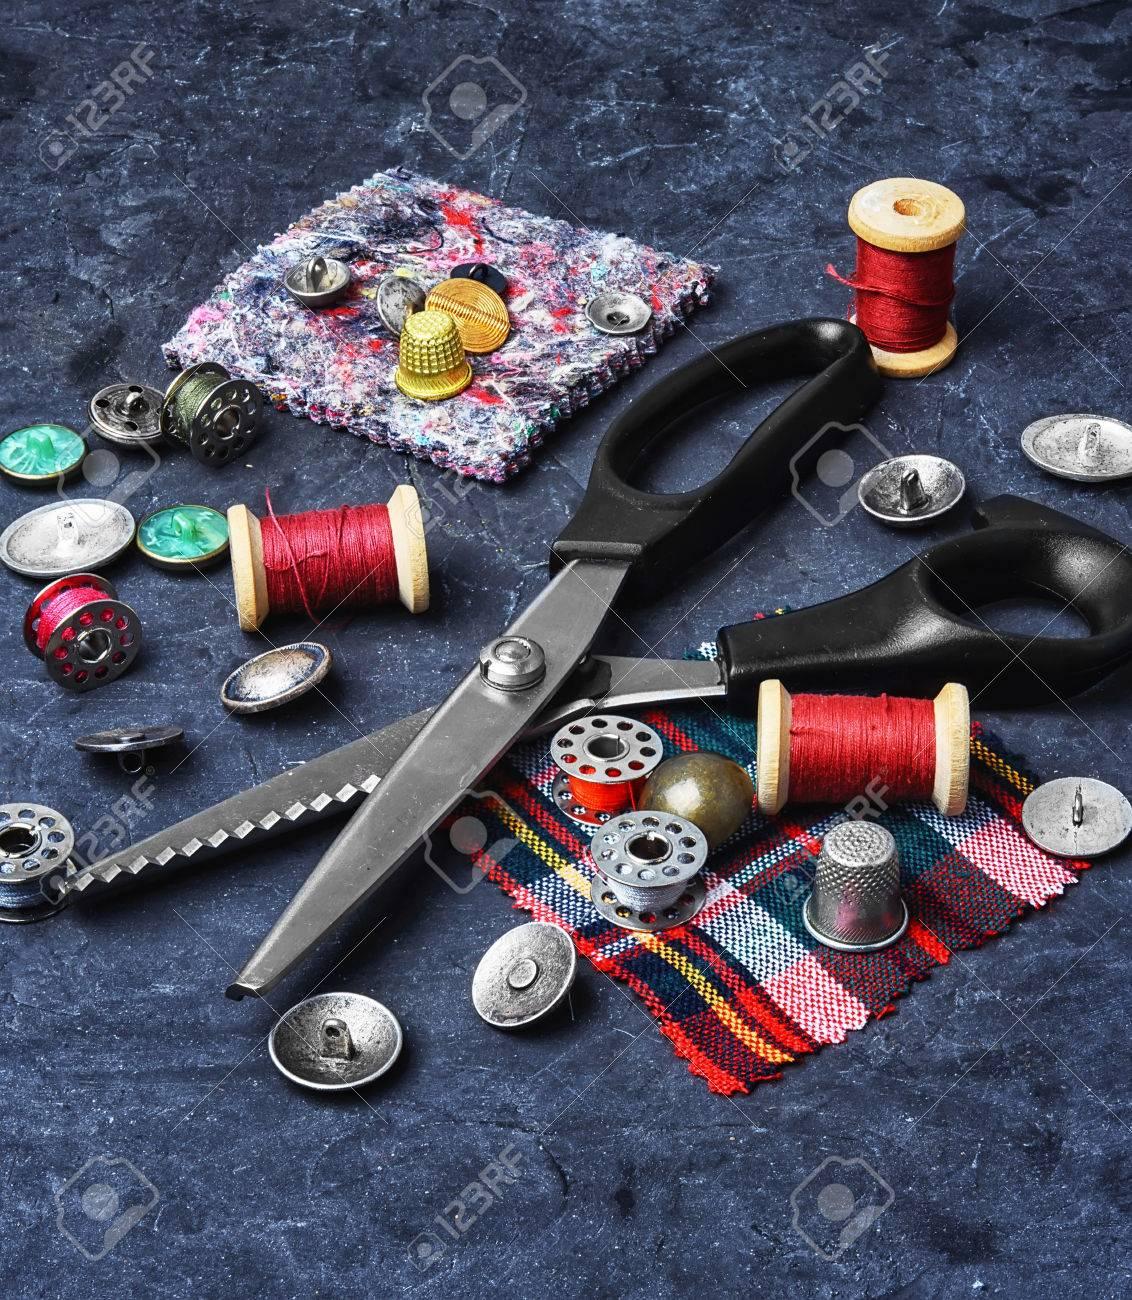 Schere, Nähen, Textil-, Material, Handwerk, Faden, Schneider ...